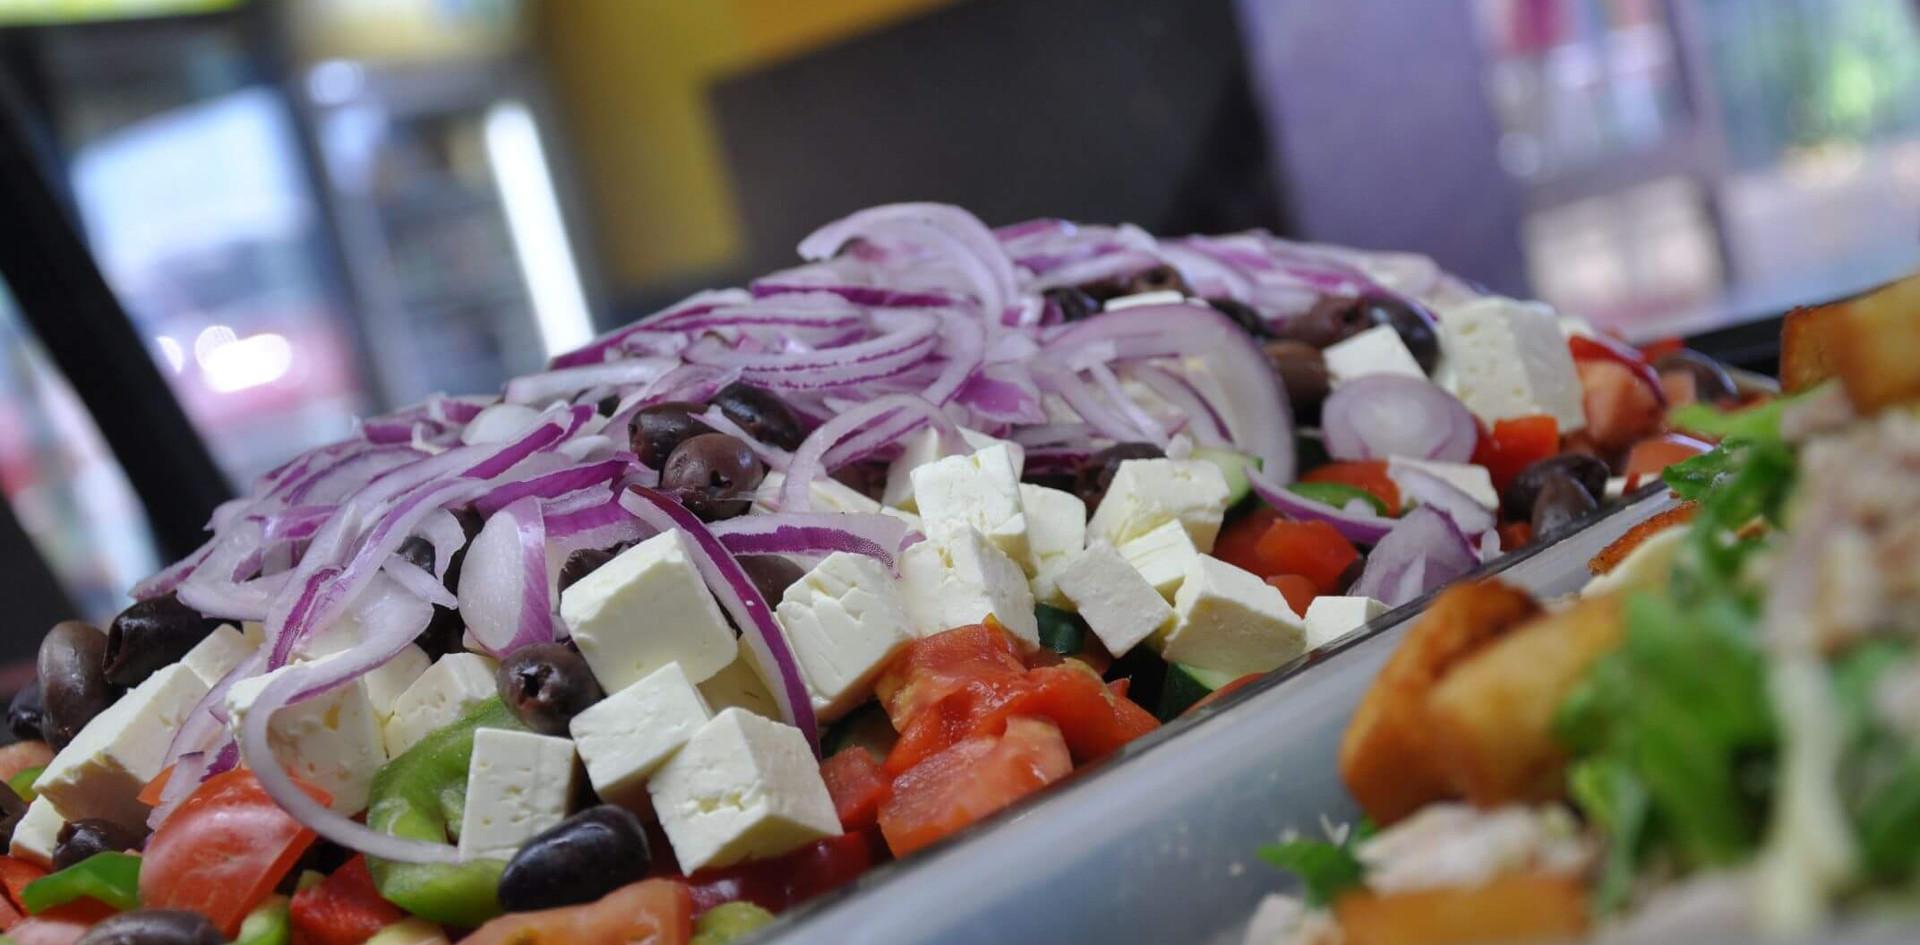 Salad-Bar-Trays-2.jpg